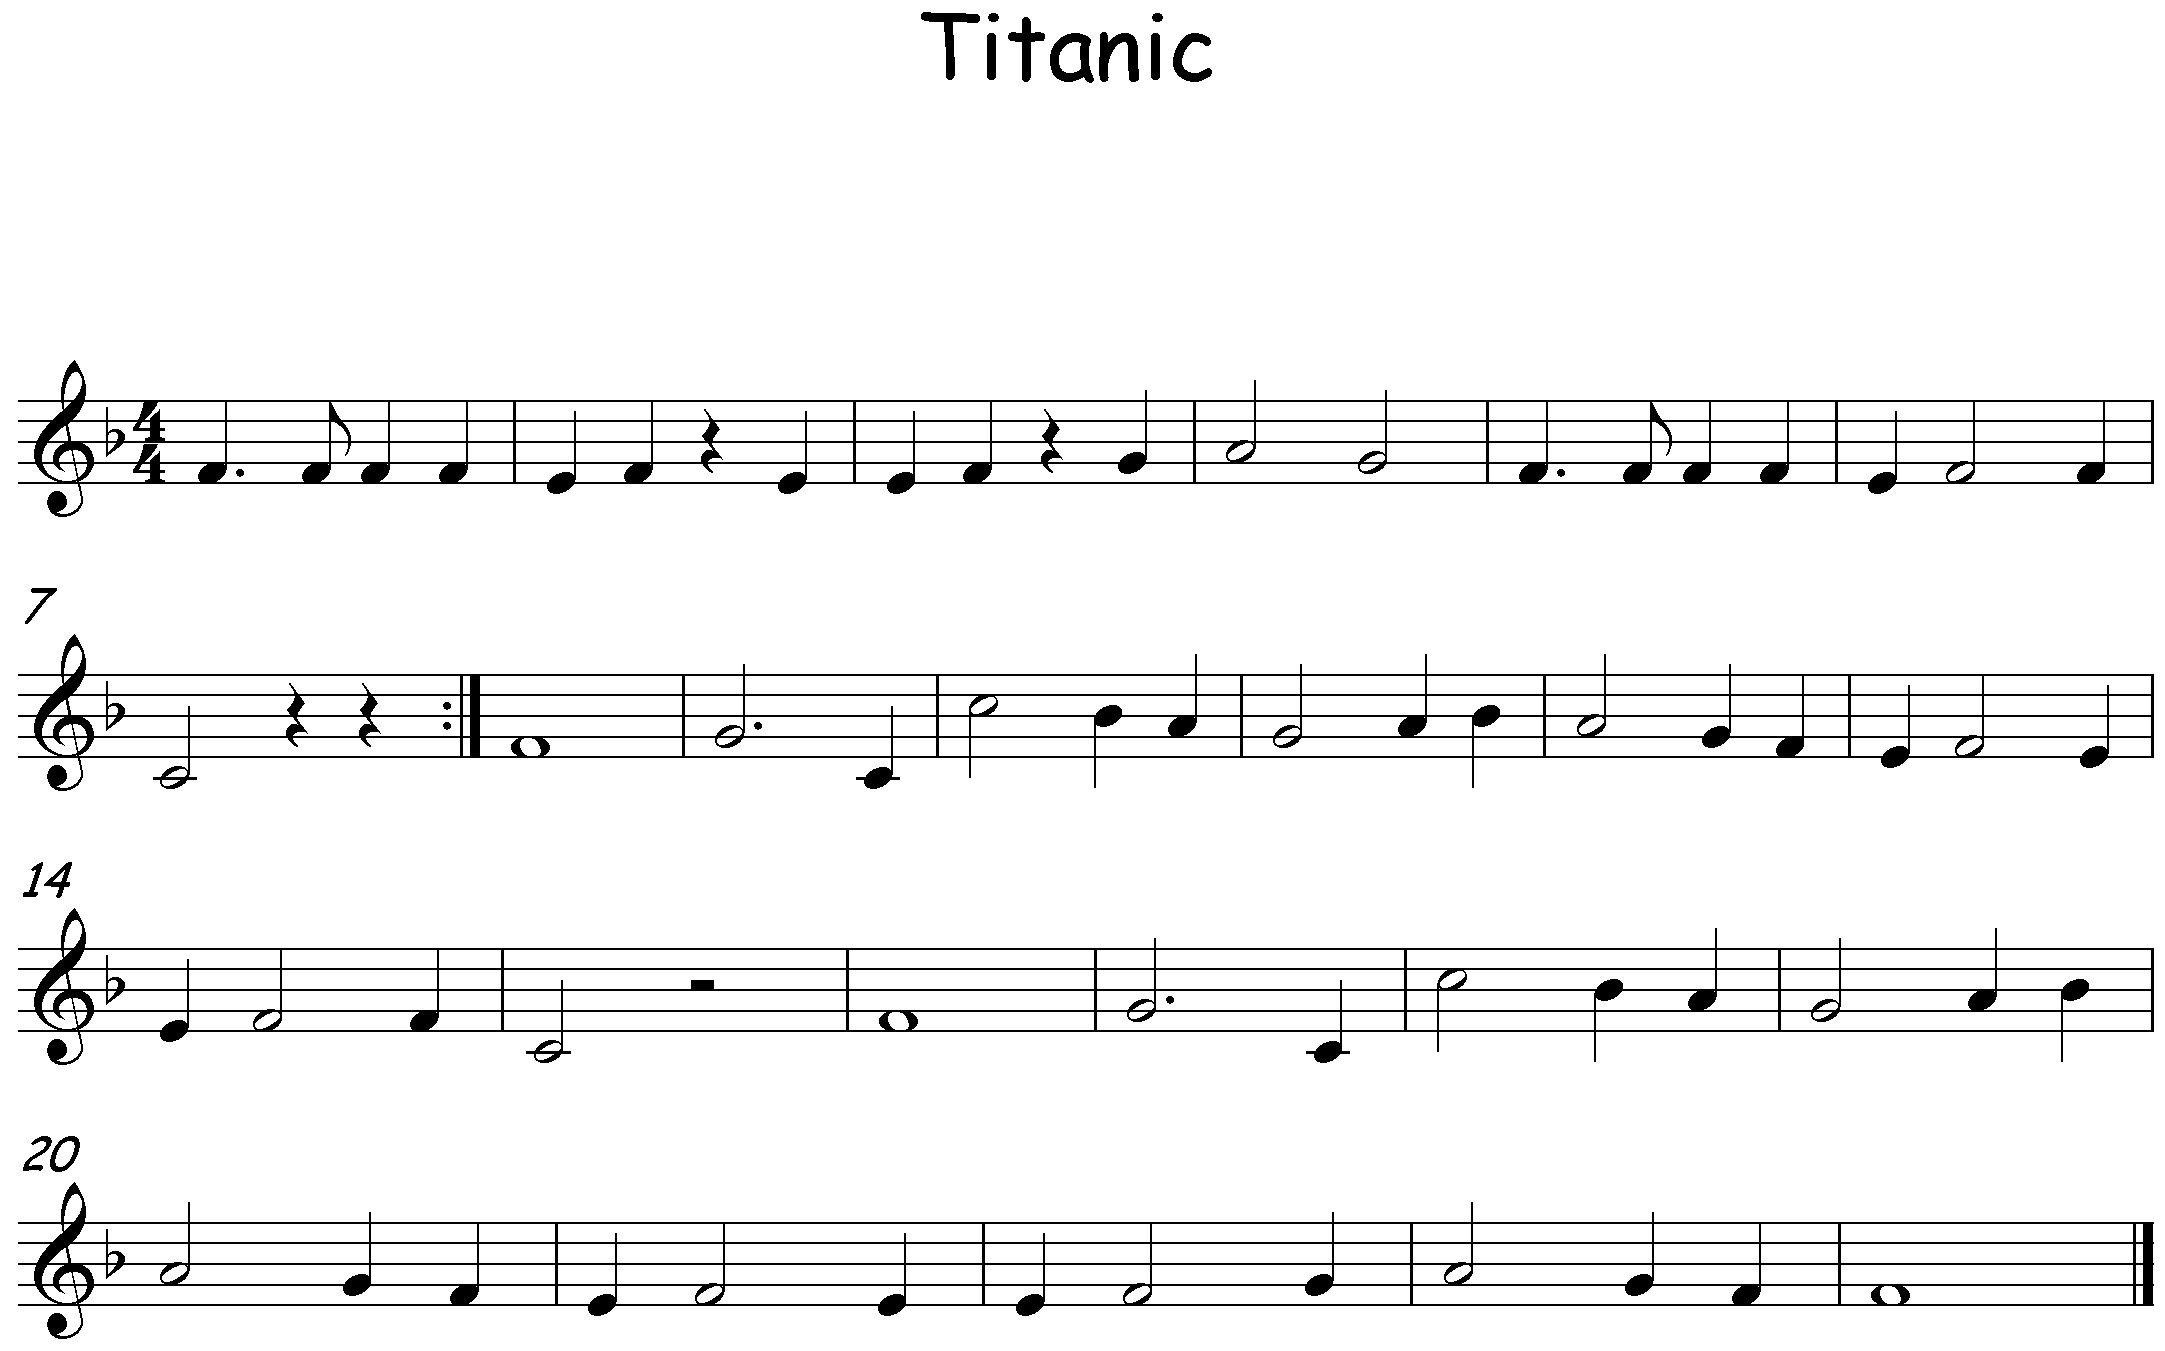 Partituras Para Flauta Dulce Identi Partituras Partitura Flauta Canciones Flauta